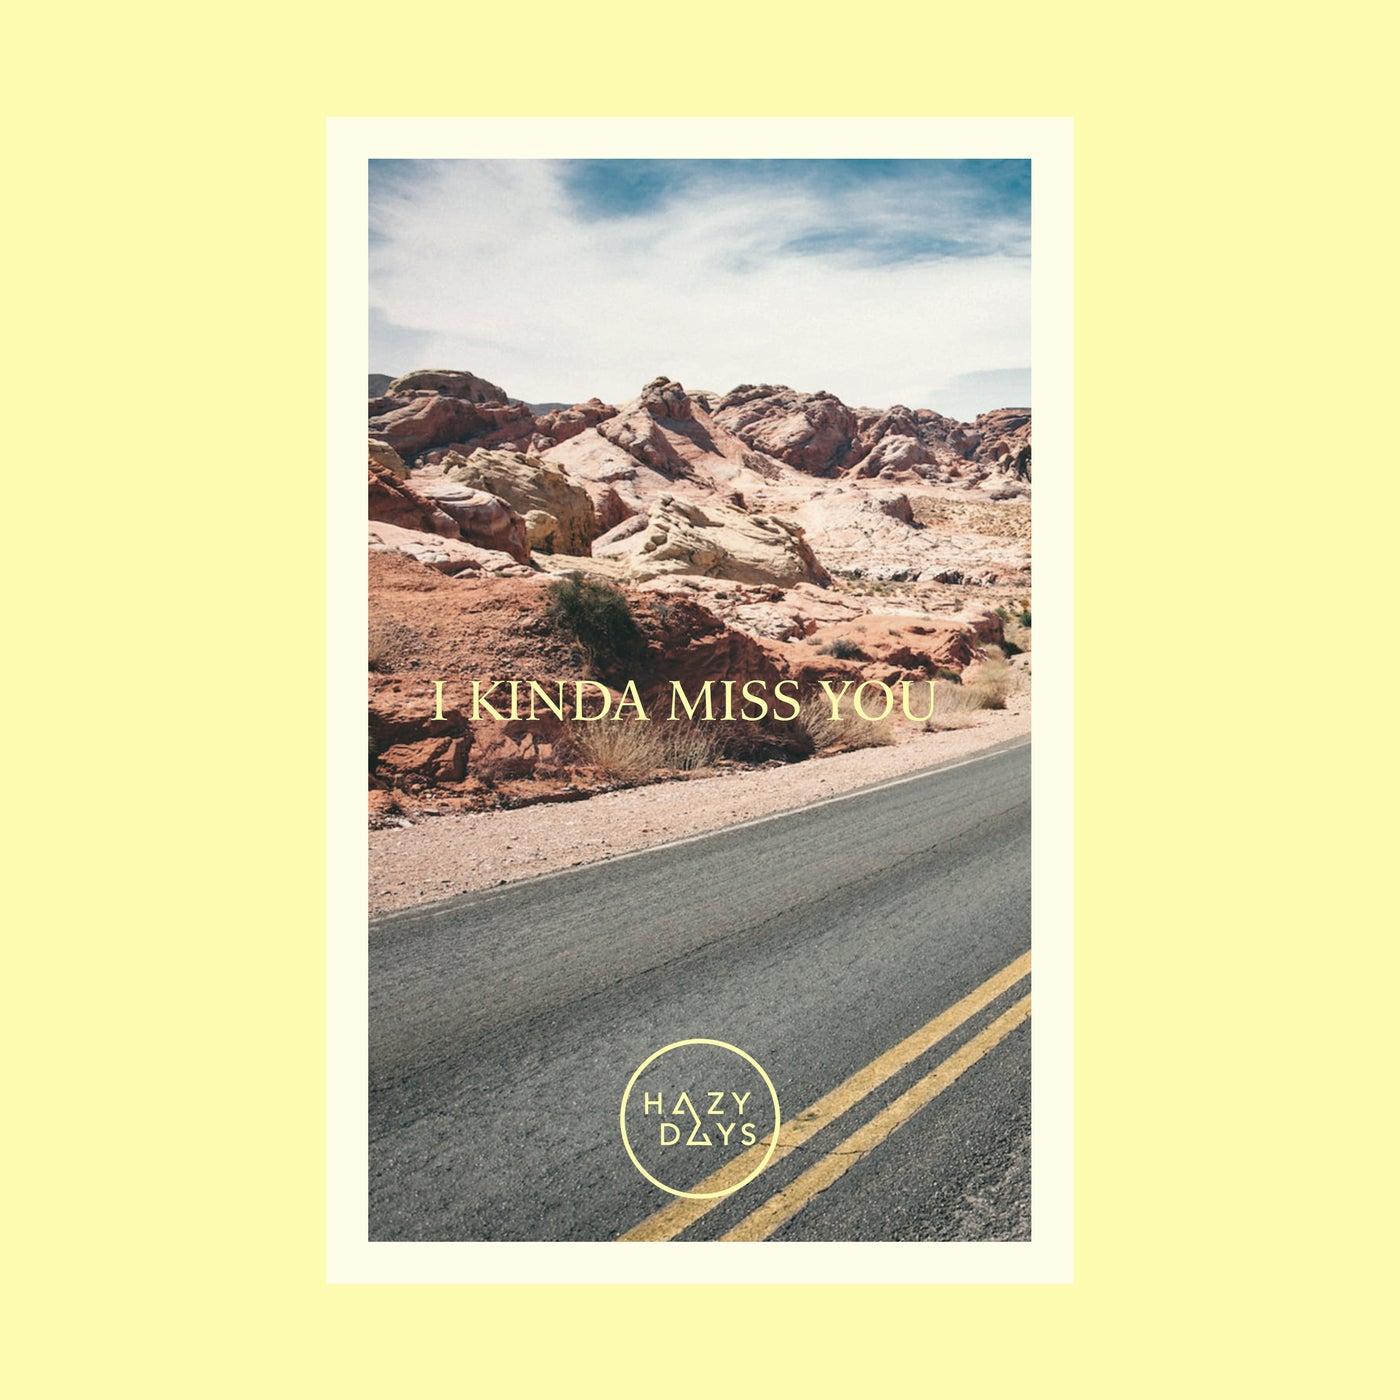 I Kinda Miss You (Original Mix)